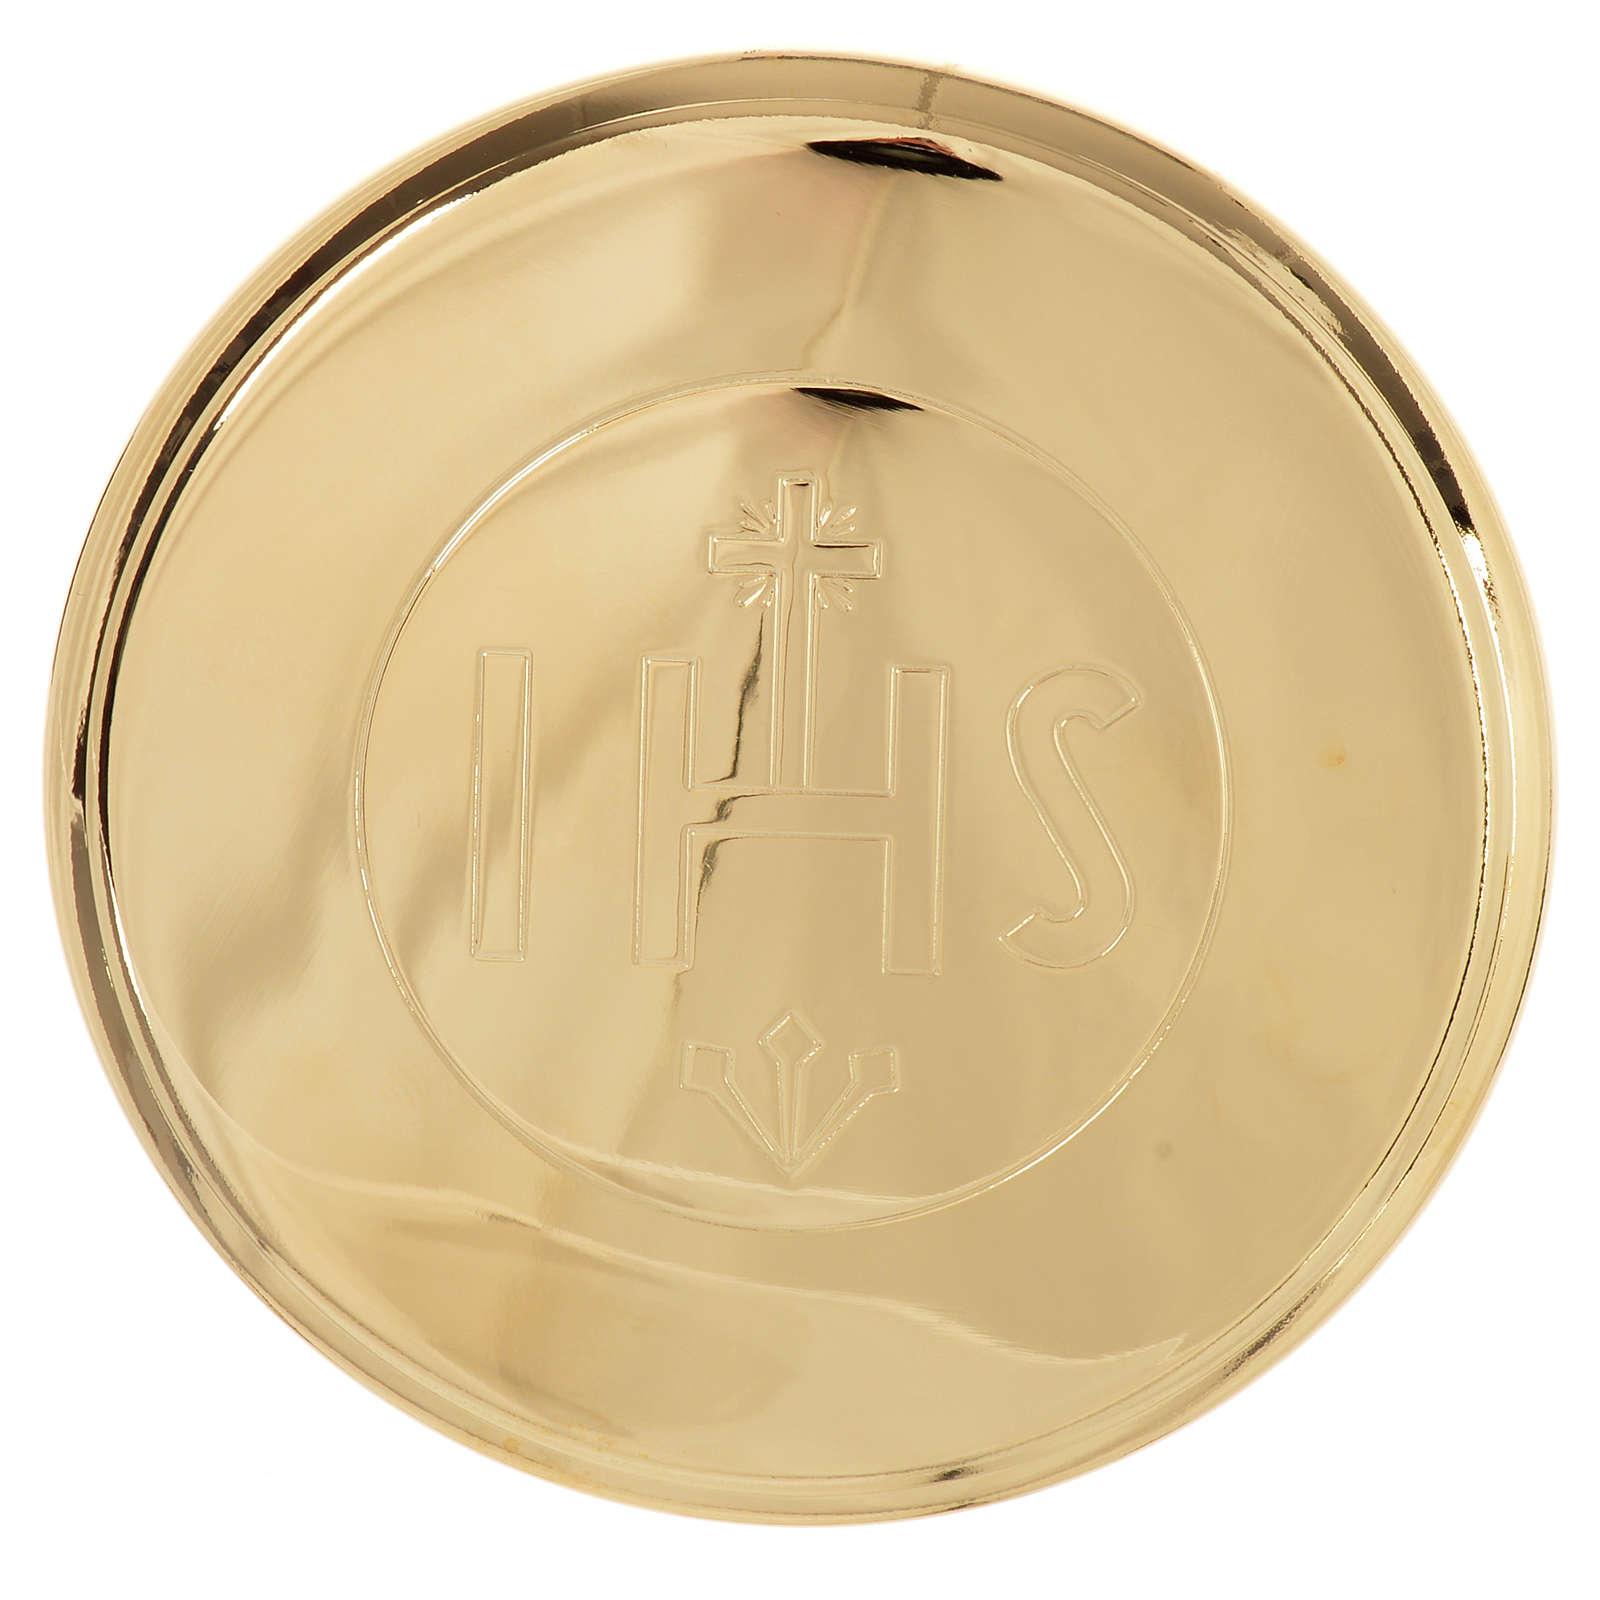 Teca ottone dorato IHS diam 7 cm 3